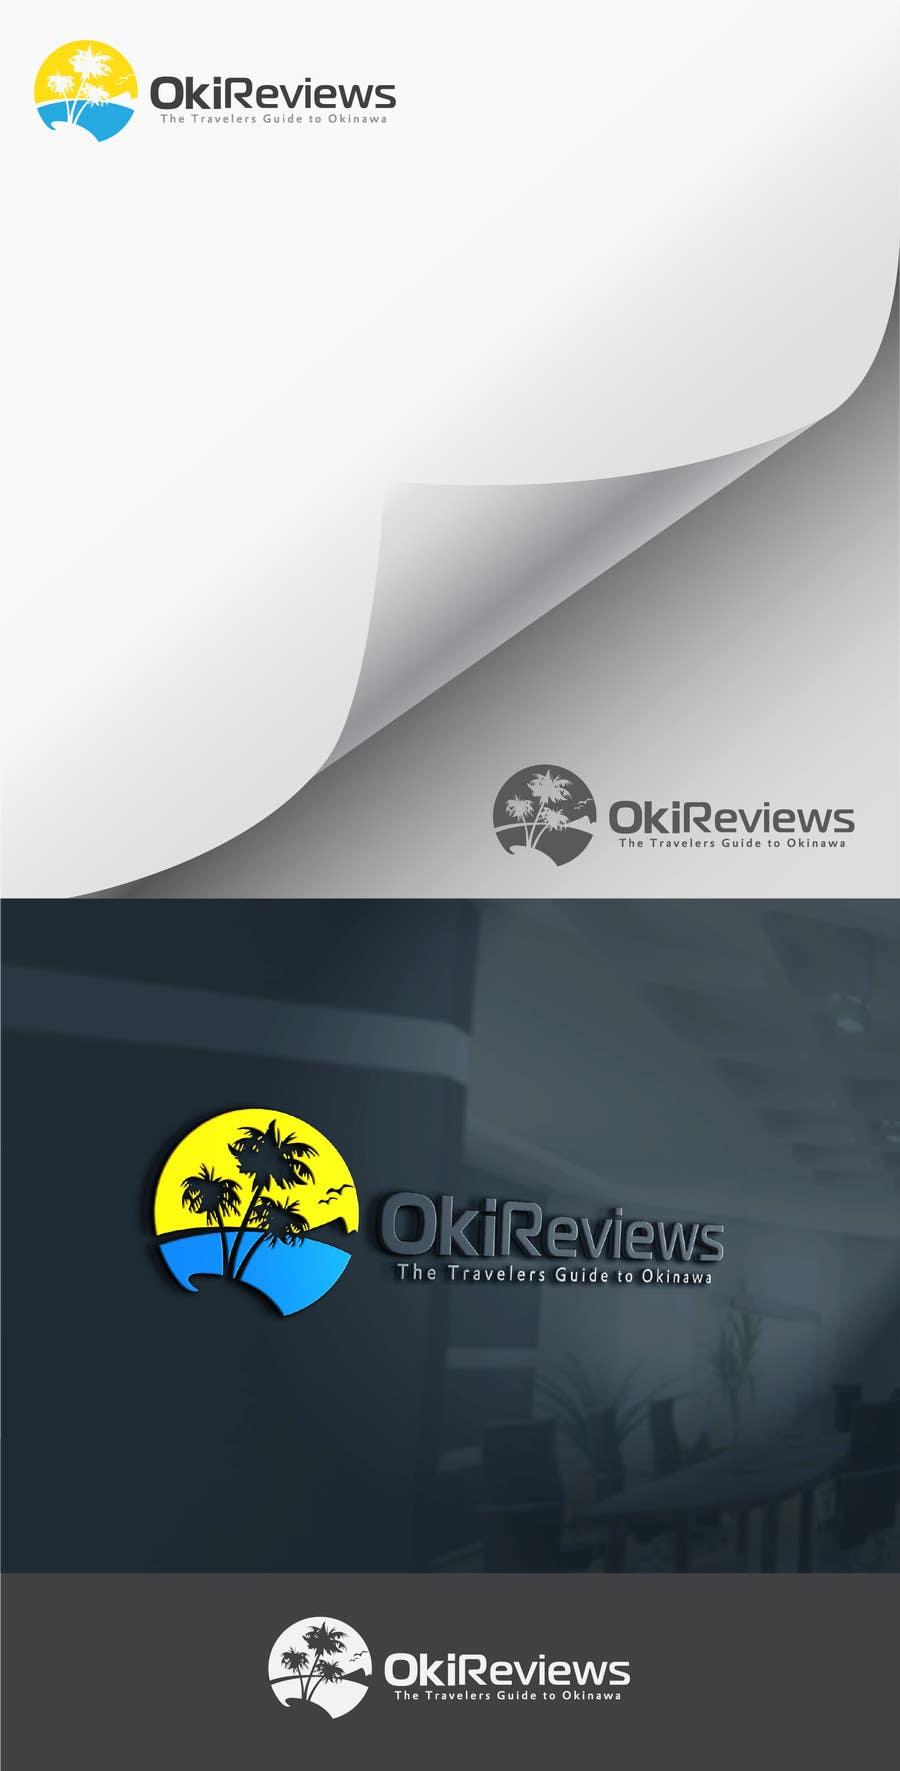 Penyertaan Peraduan #81 untuk Design a Logo for a Travel Review Site